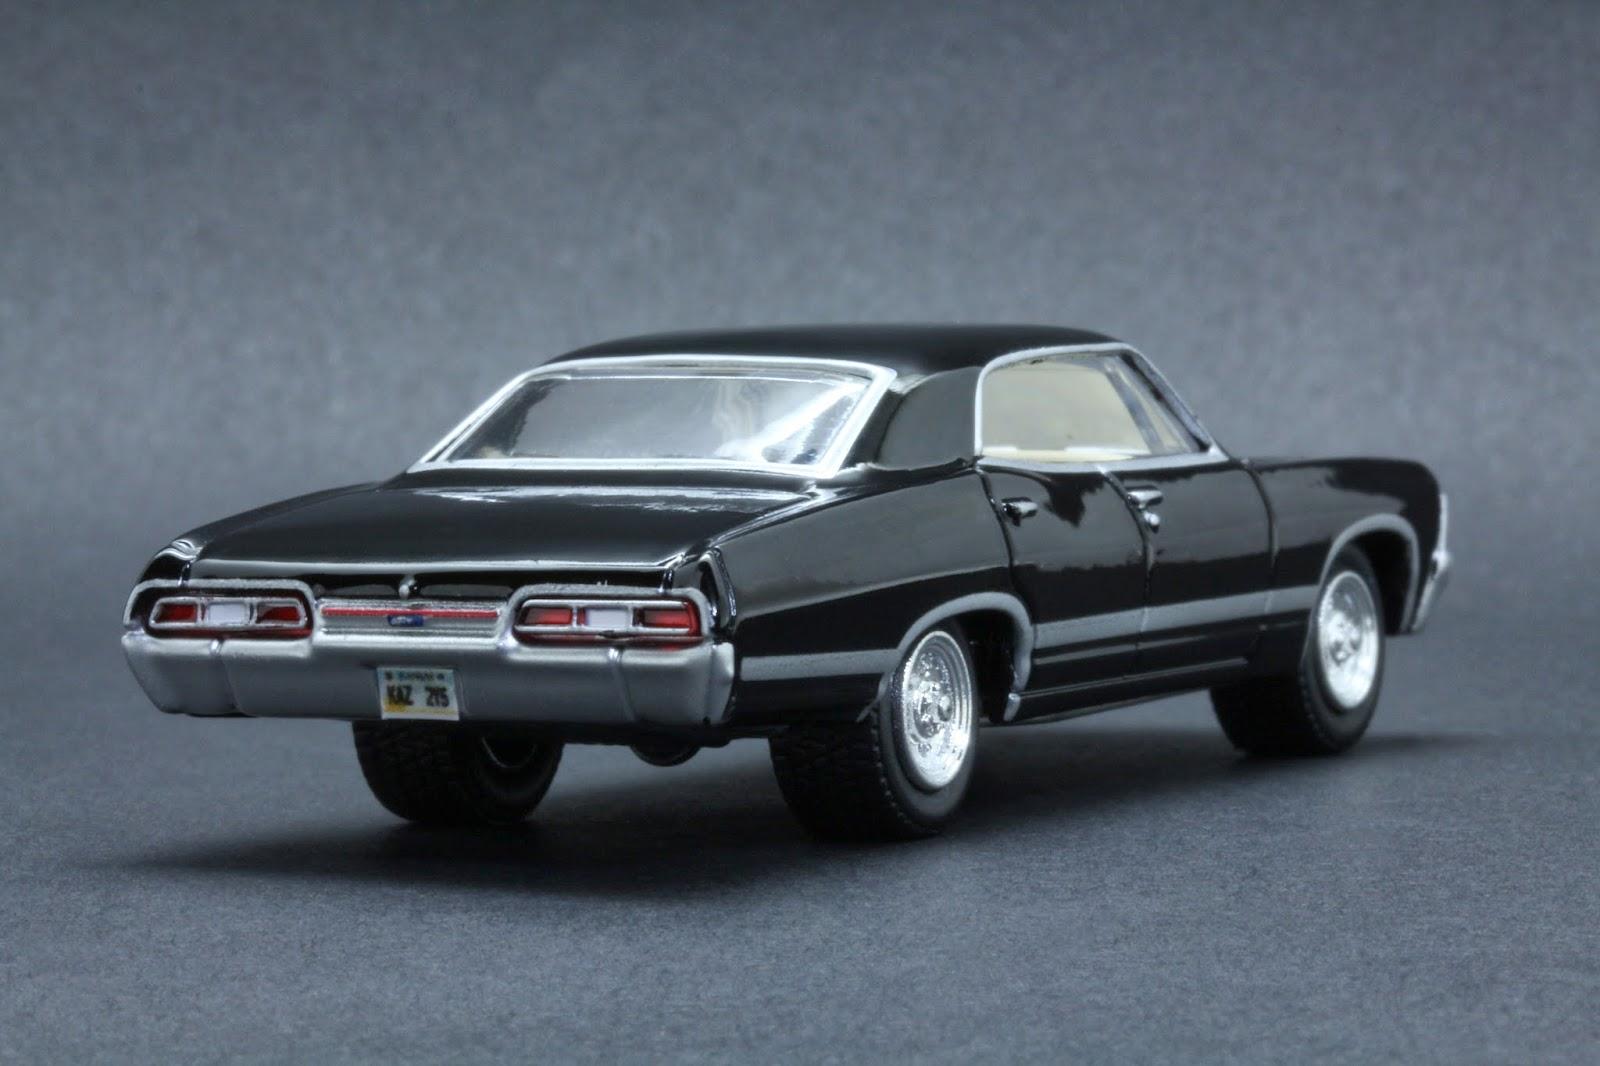 diecast hobbist 1967 chevrolet impala sedan. Black Bedroom Furniture Sets. Home Design Ideas